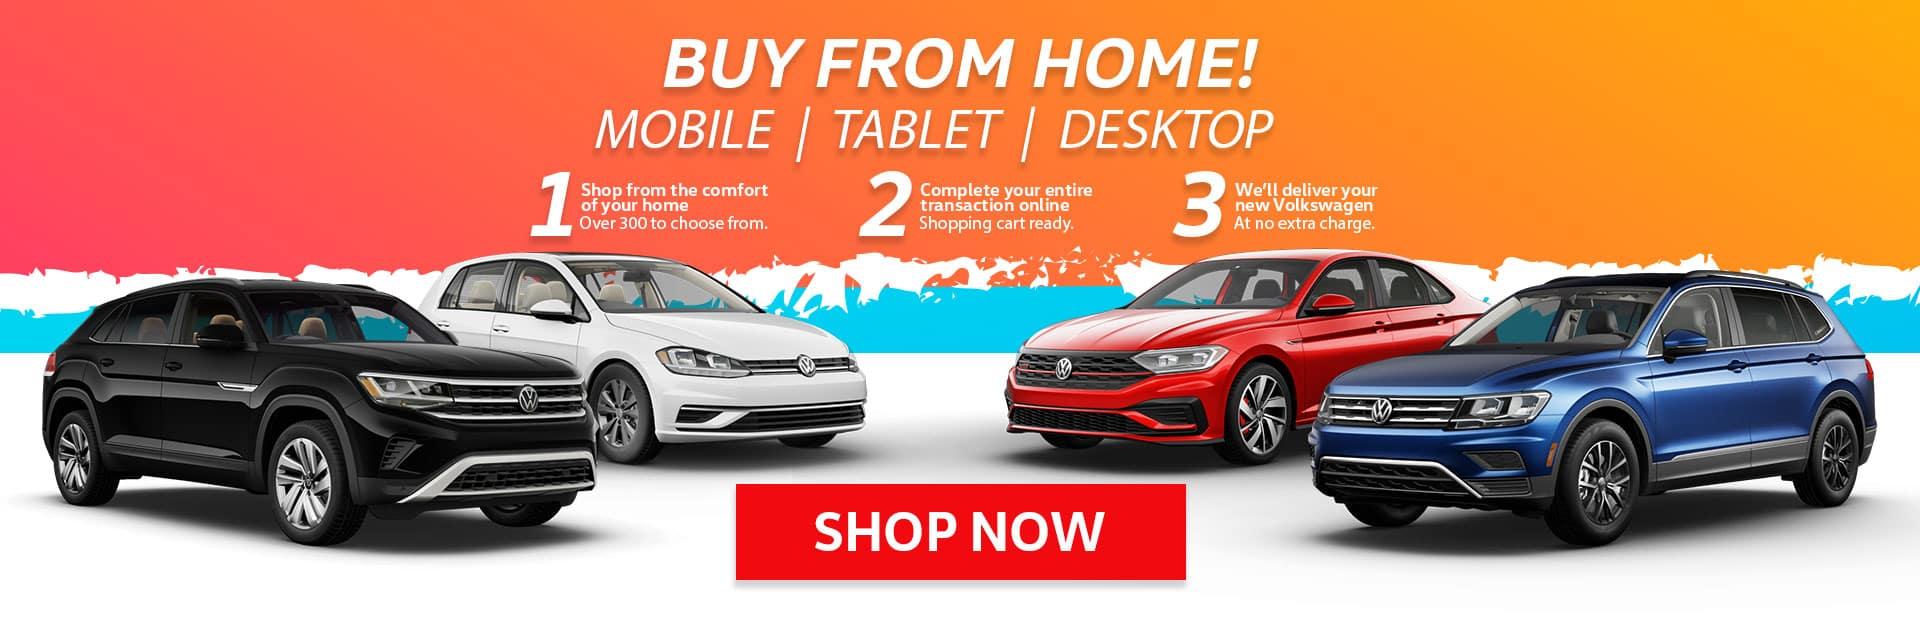 vw-shop-online-express-store